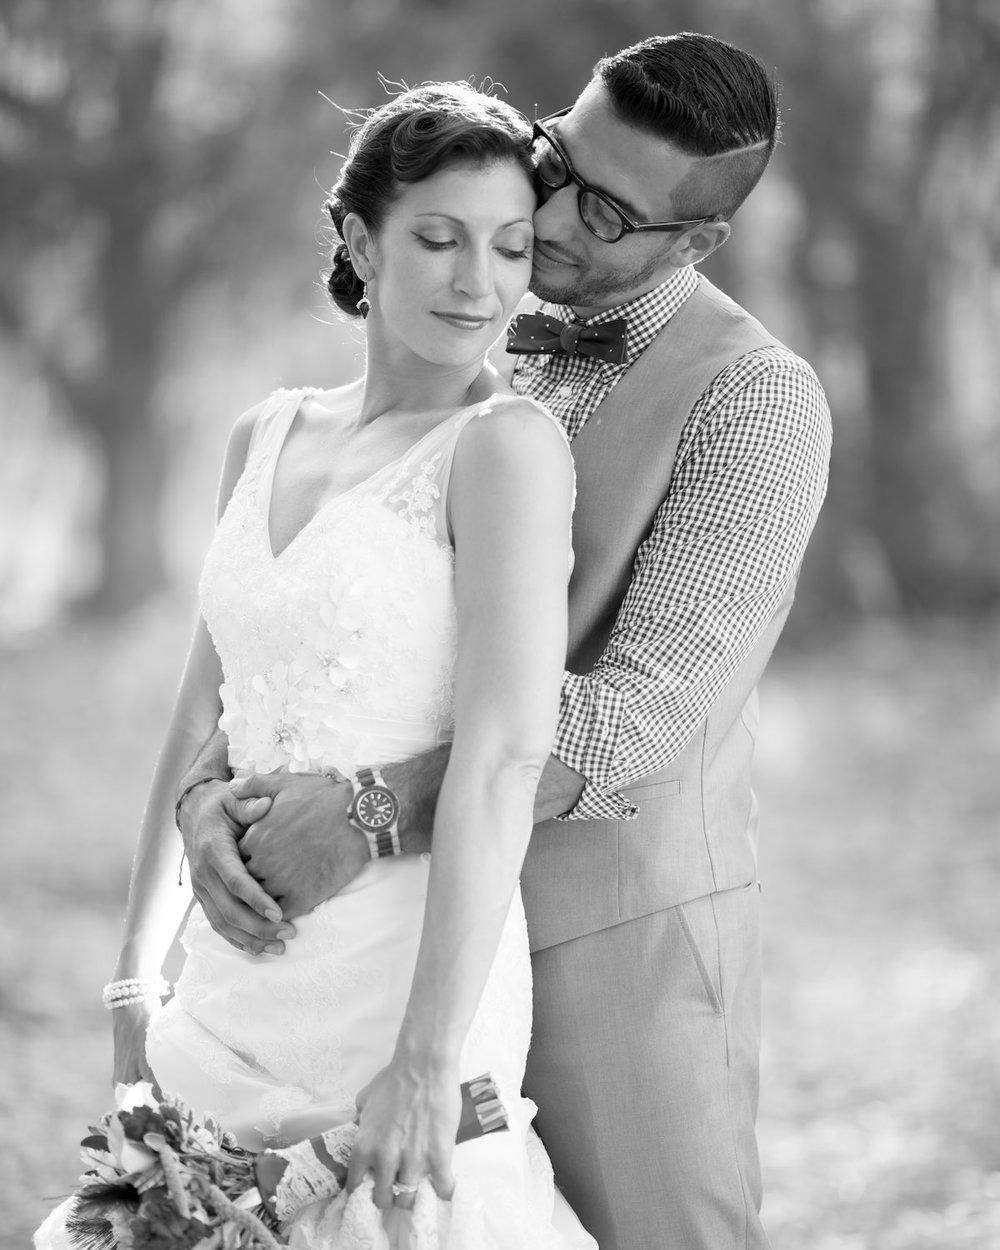 anta-ana-wedding-michal-pfeil-33.jpg